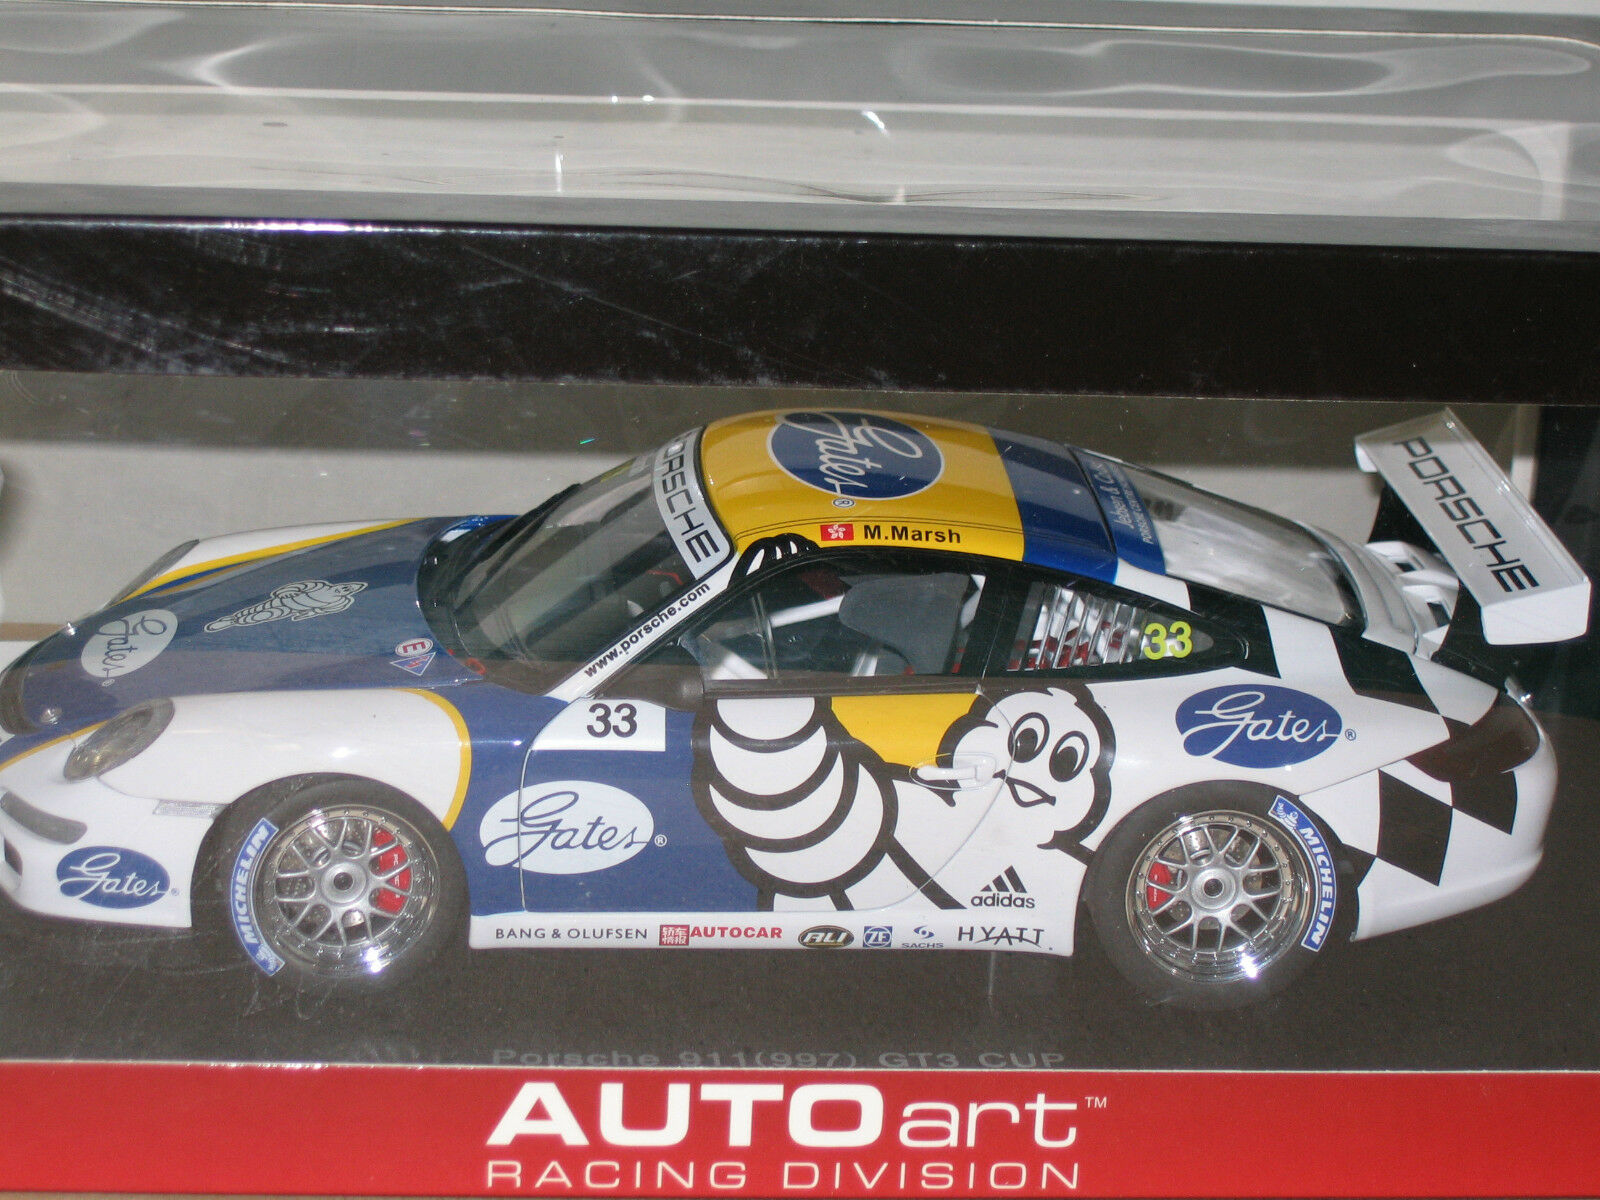 1 18 AUTOART PORSCHE 911 ( 997 ) GT3 CARRERA CUP PCCA 2006 M.MARSH MICHELIN